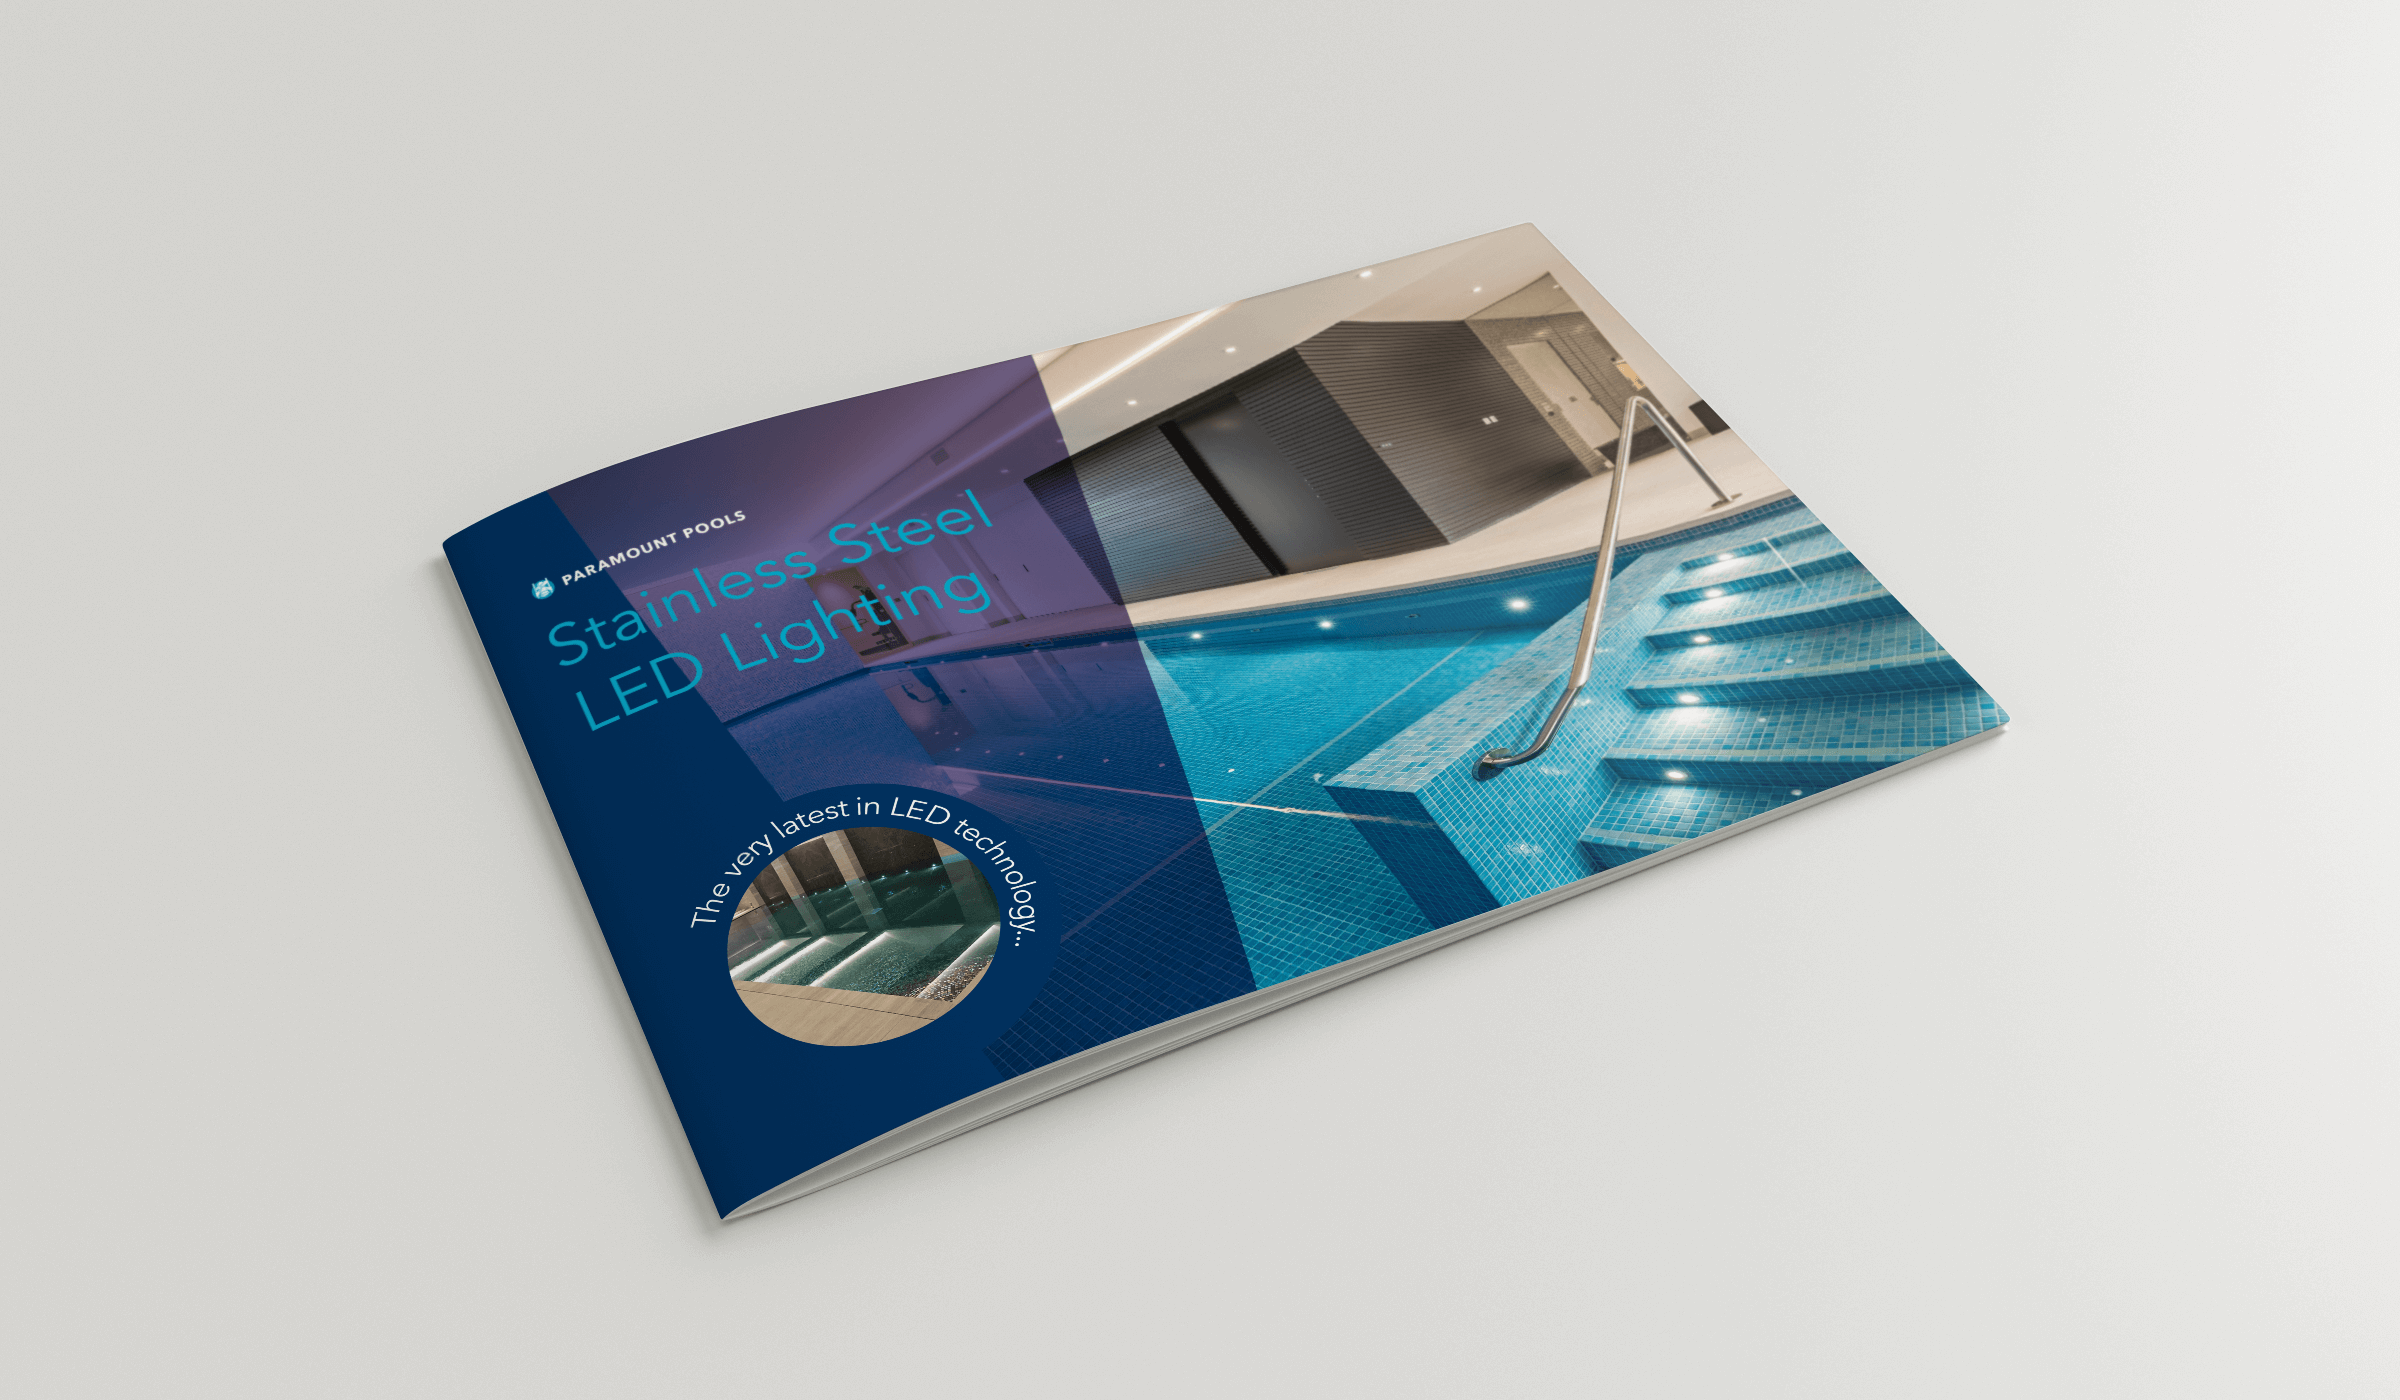 Paramount Pools LED Brochure